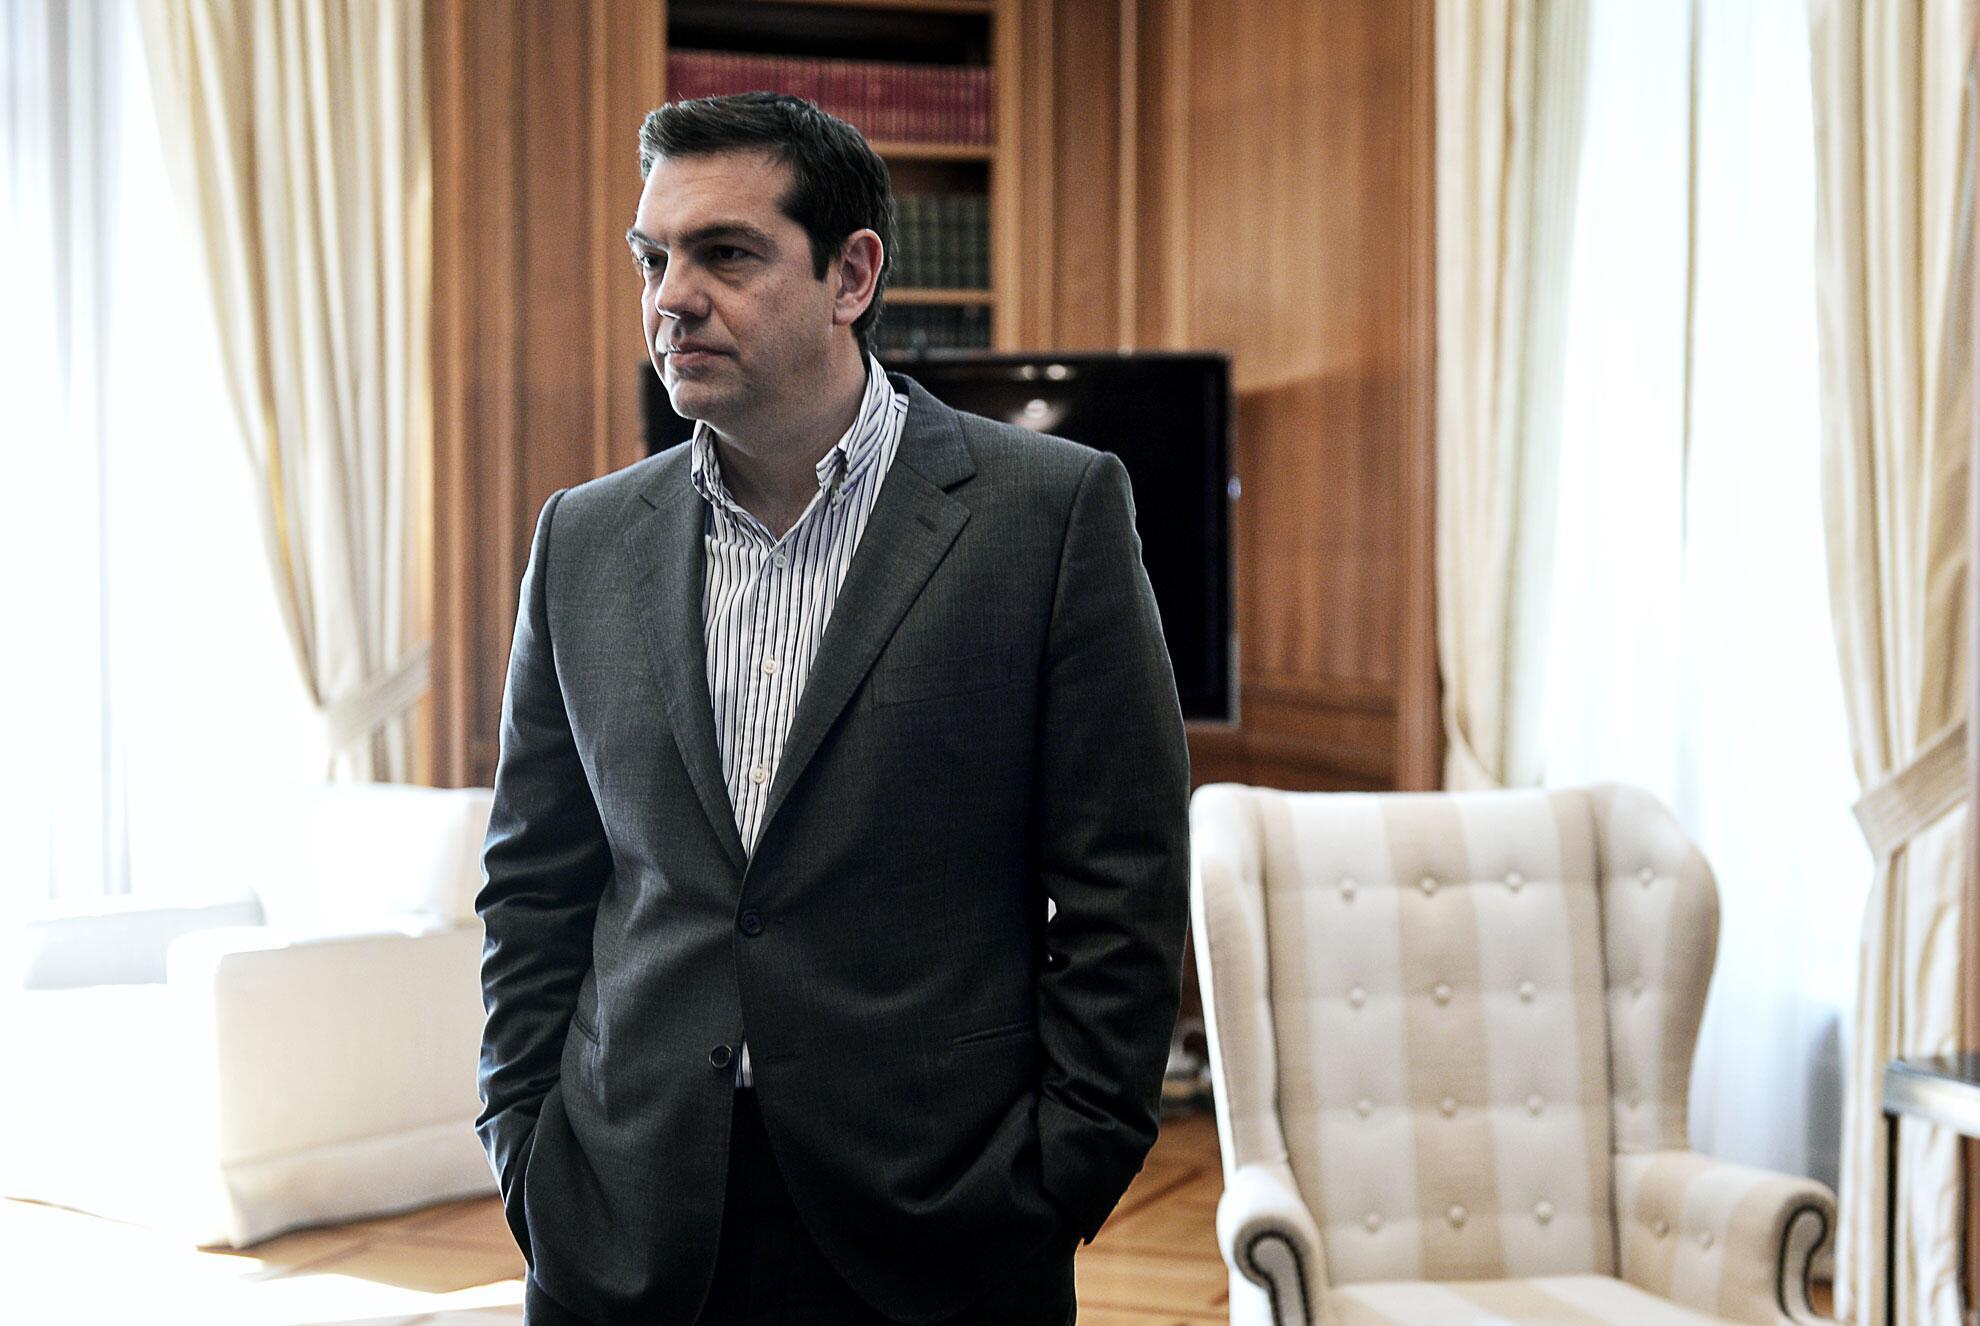 Bild zu Griechenlands Regierungschef Tsipras